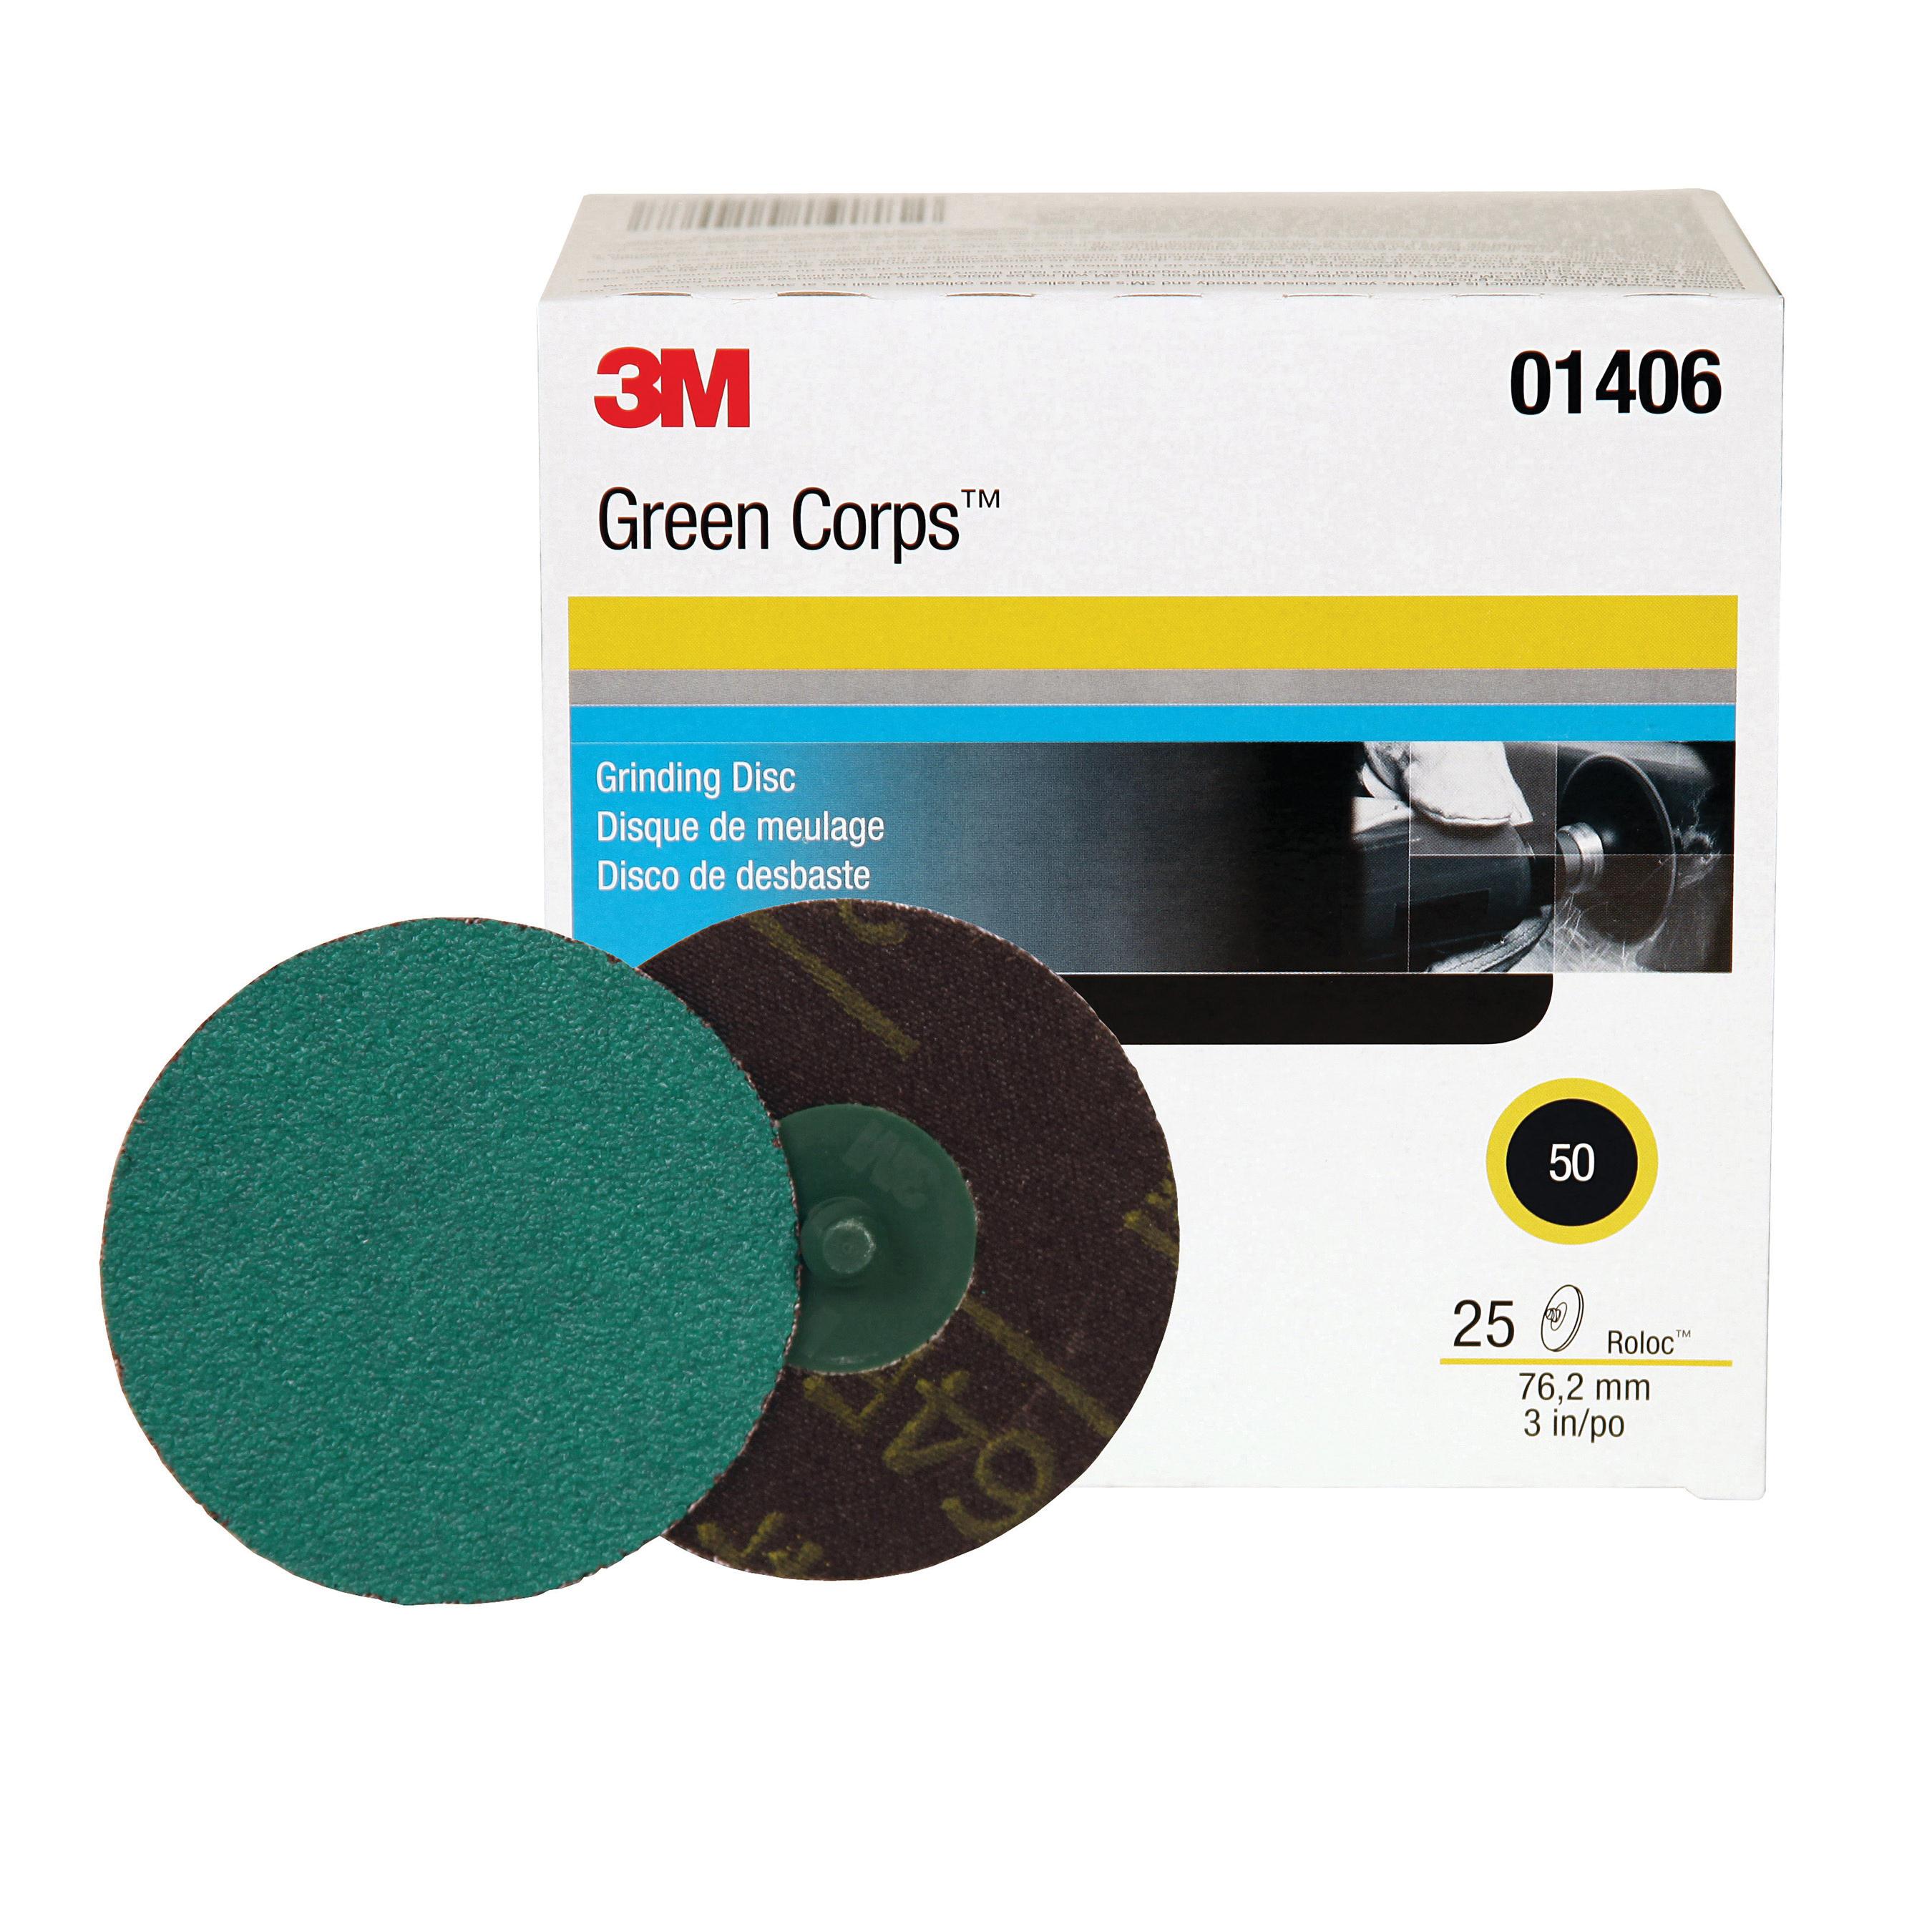 3M™ Green Corps™ Roloc™ 051131-01406 264F Quick-Change Coated Abrasive Disc, 3 in Dia Disc, 50 Grit, Coarse Grade, Aluminum Oxide Abrasive, Roloc™ Attachment